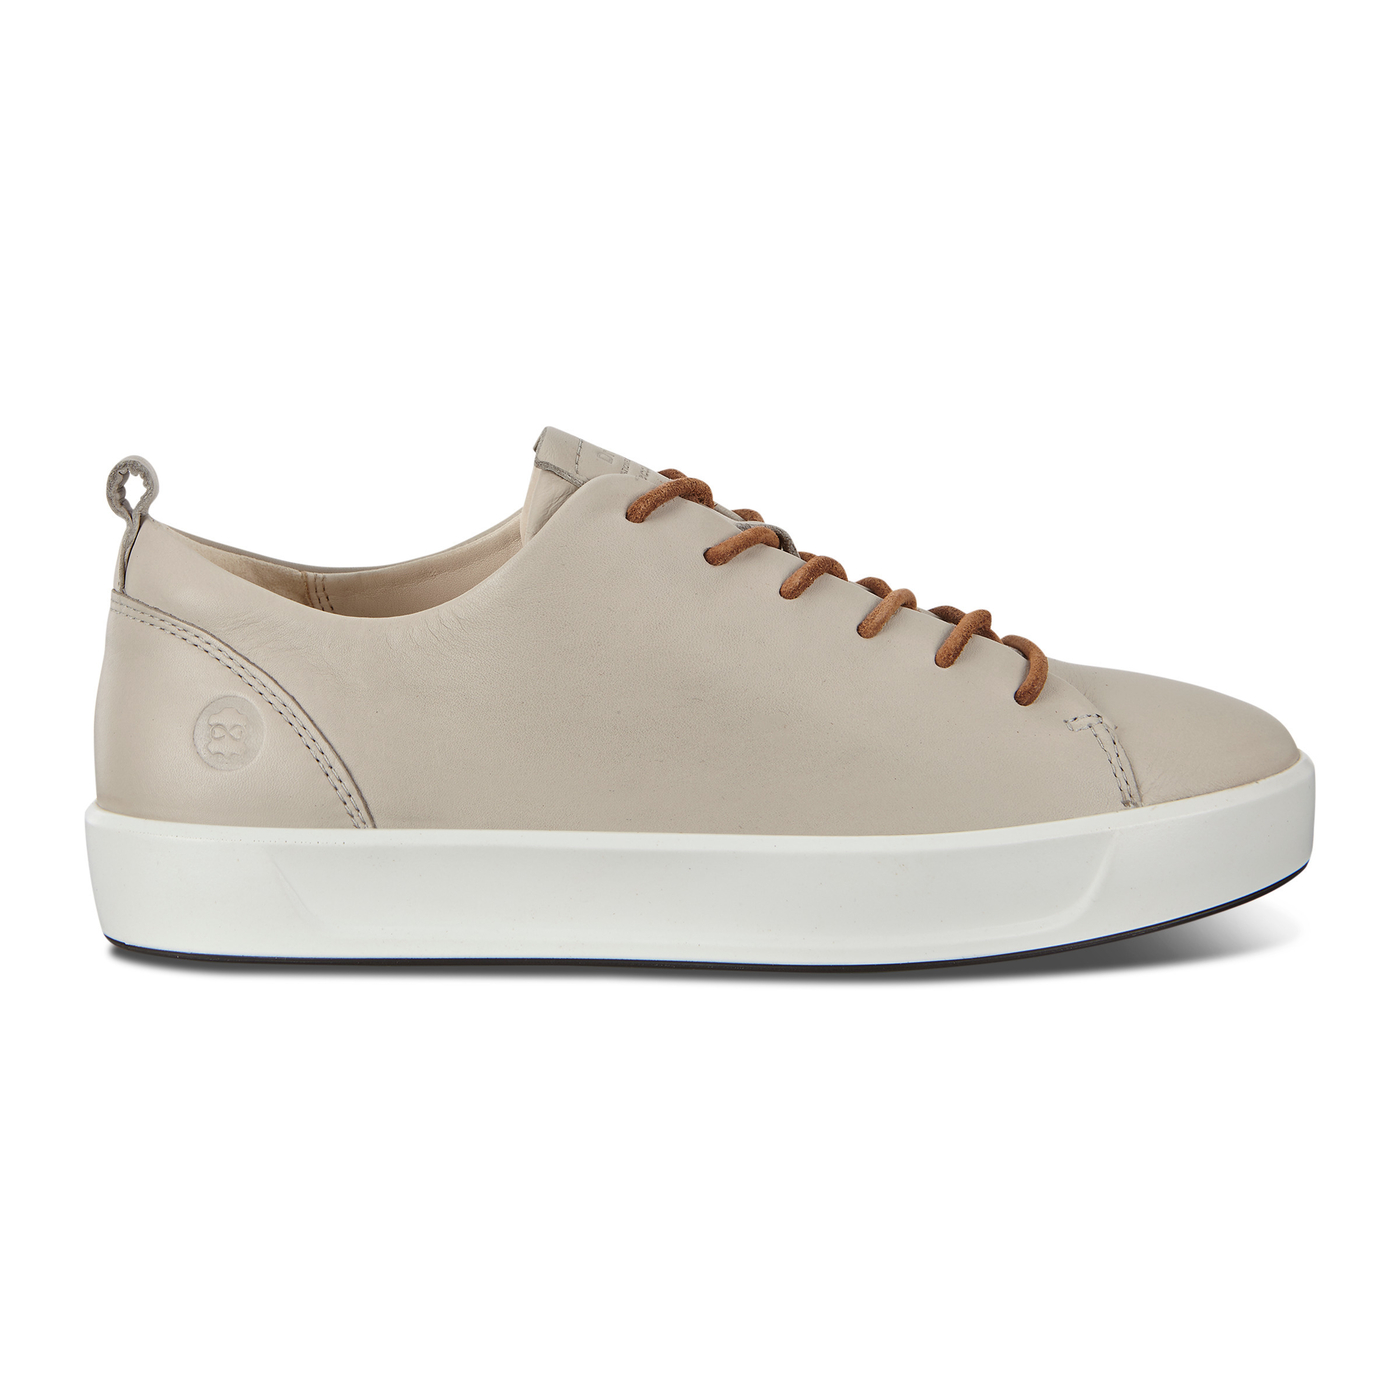 ECCO SOFT 8 Womens DriTan Sneaker Tie